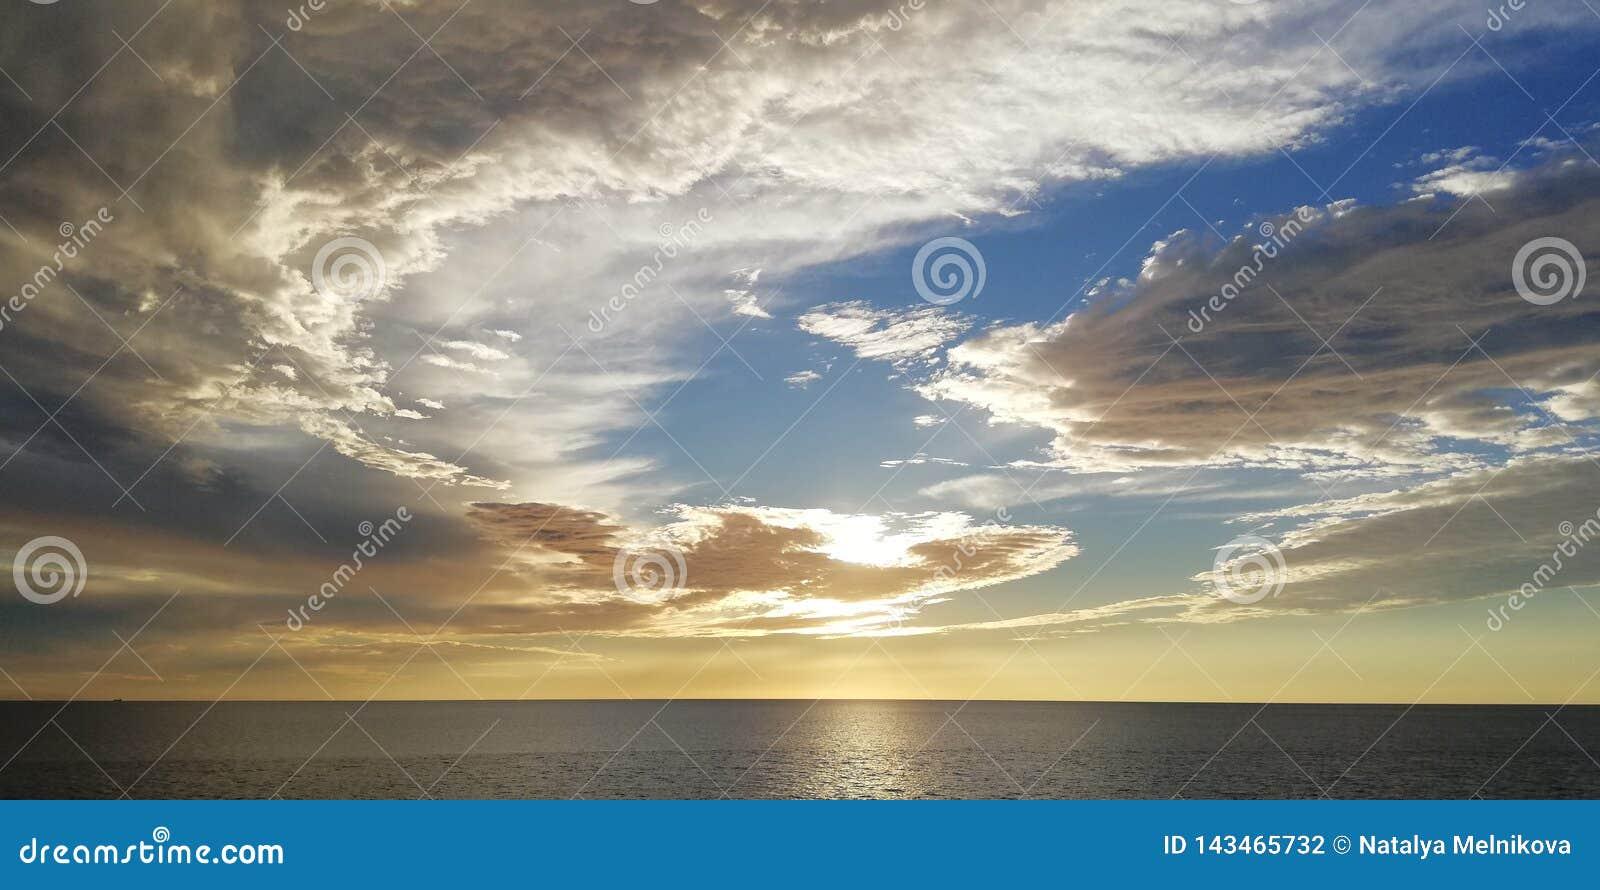 Seascape Ασυνήθιστα σύννεφα στο ηλιοβασίλεμα